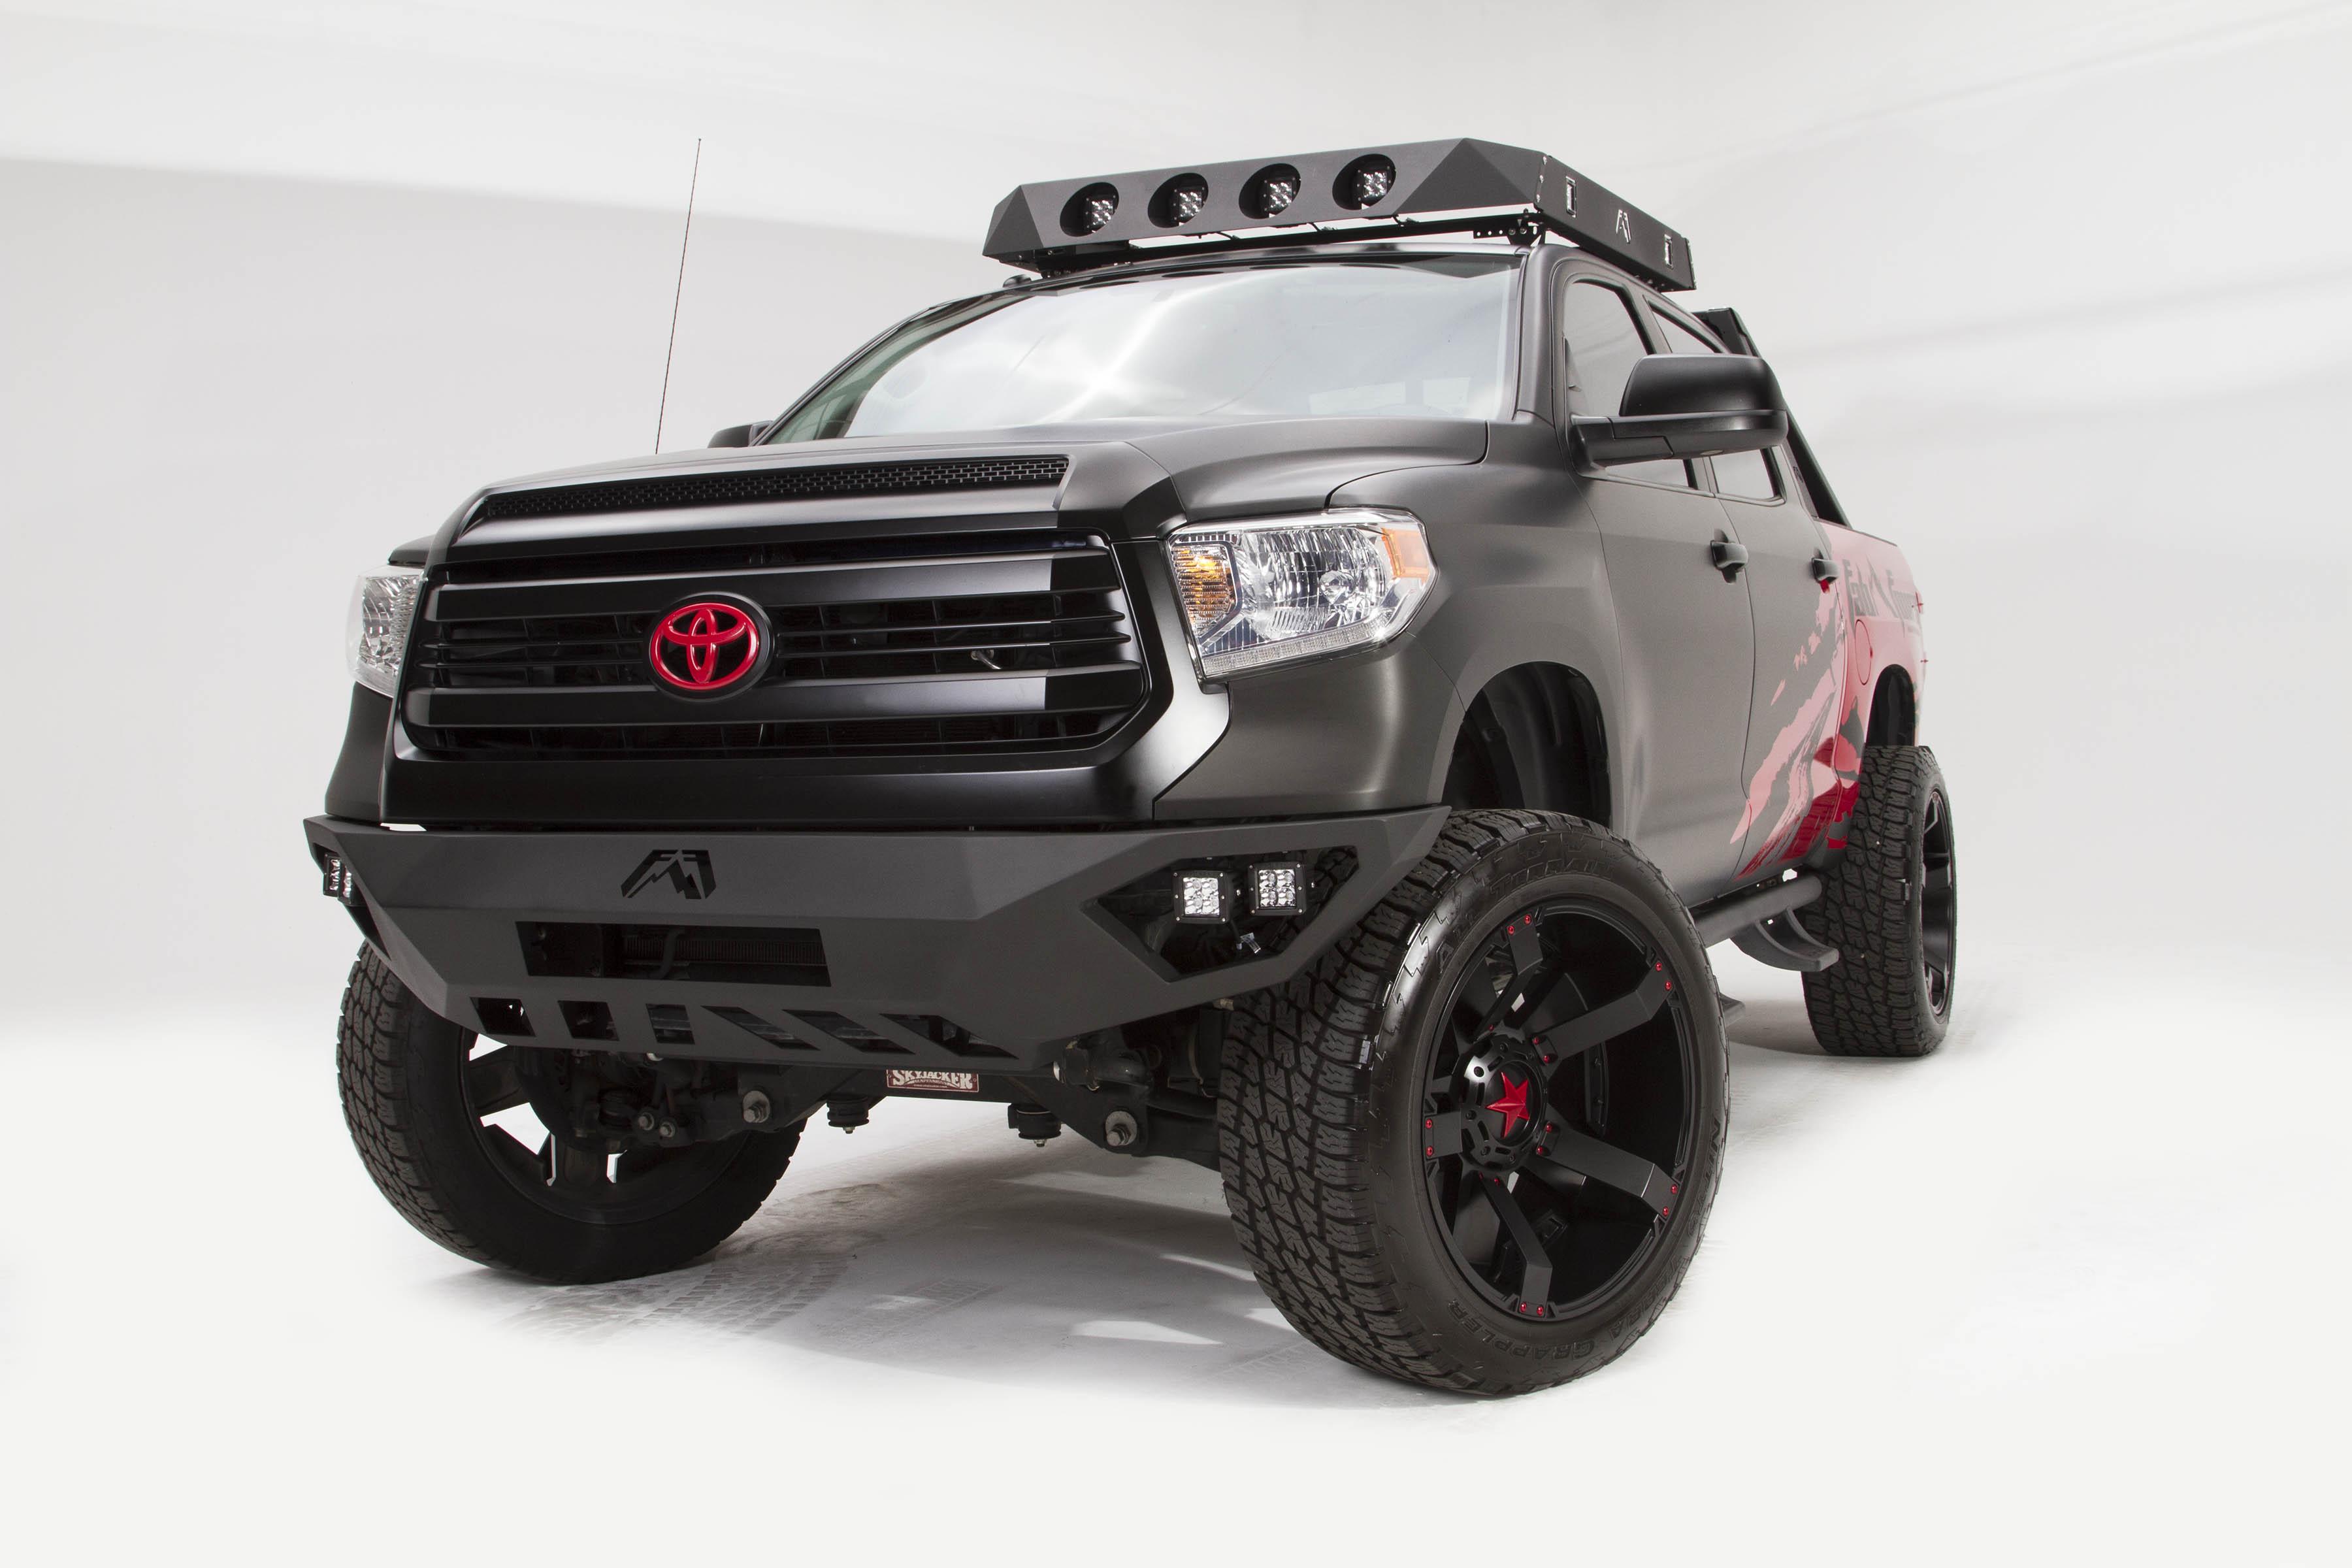 Road Rhino Bumper >> Fab Fours 2014+ Tundra Vengeance Front Bumper w/No Guard 2014-2019 [TT14-D2851-1] - $1,699.99 ...